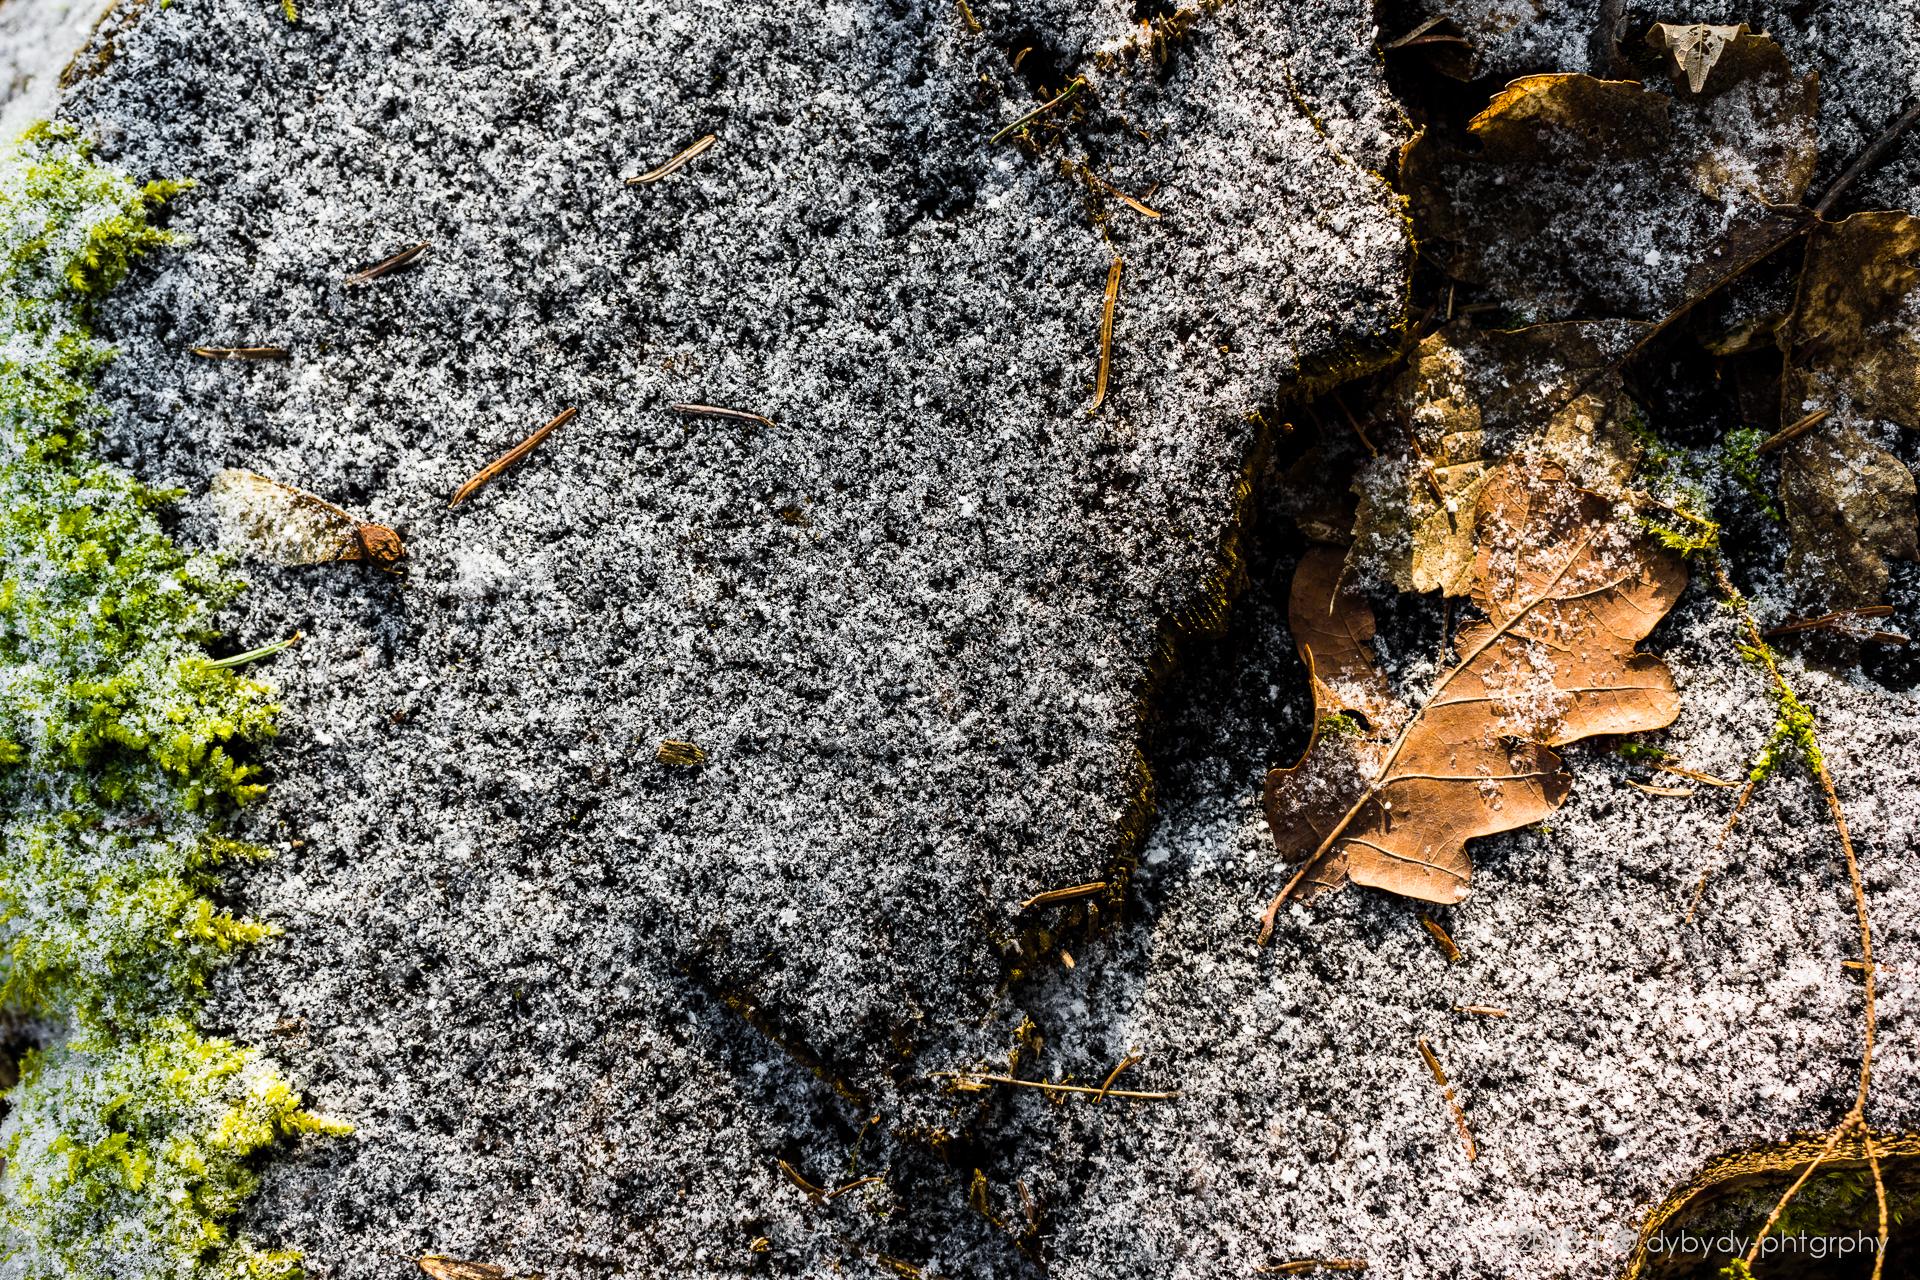 three flattened seasons  - sony nex 7 | sigma 30 f2.8 | f4.0 | ISO100 | 1/125